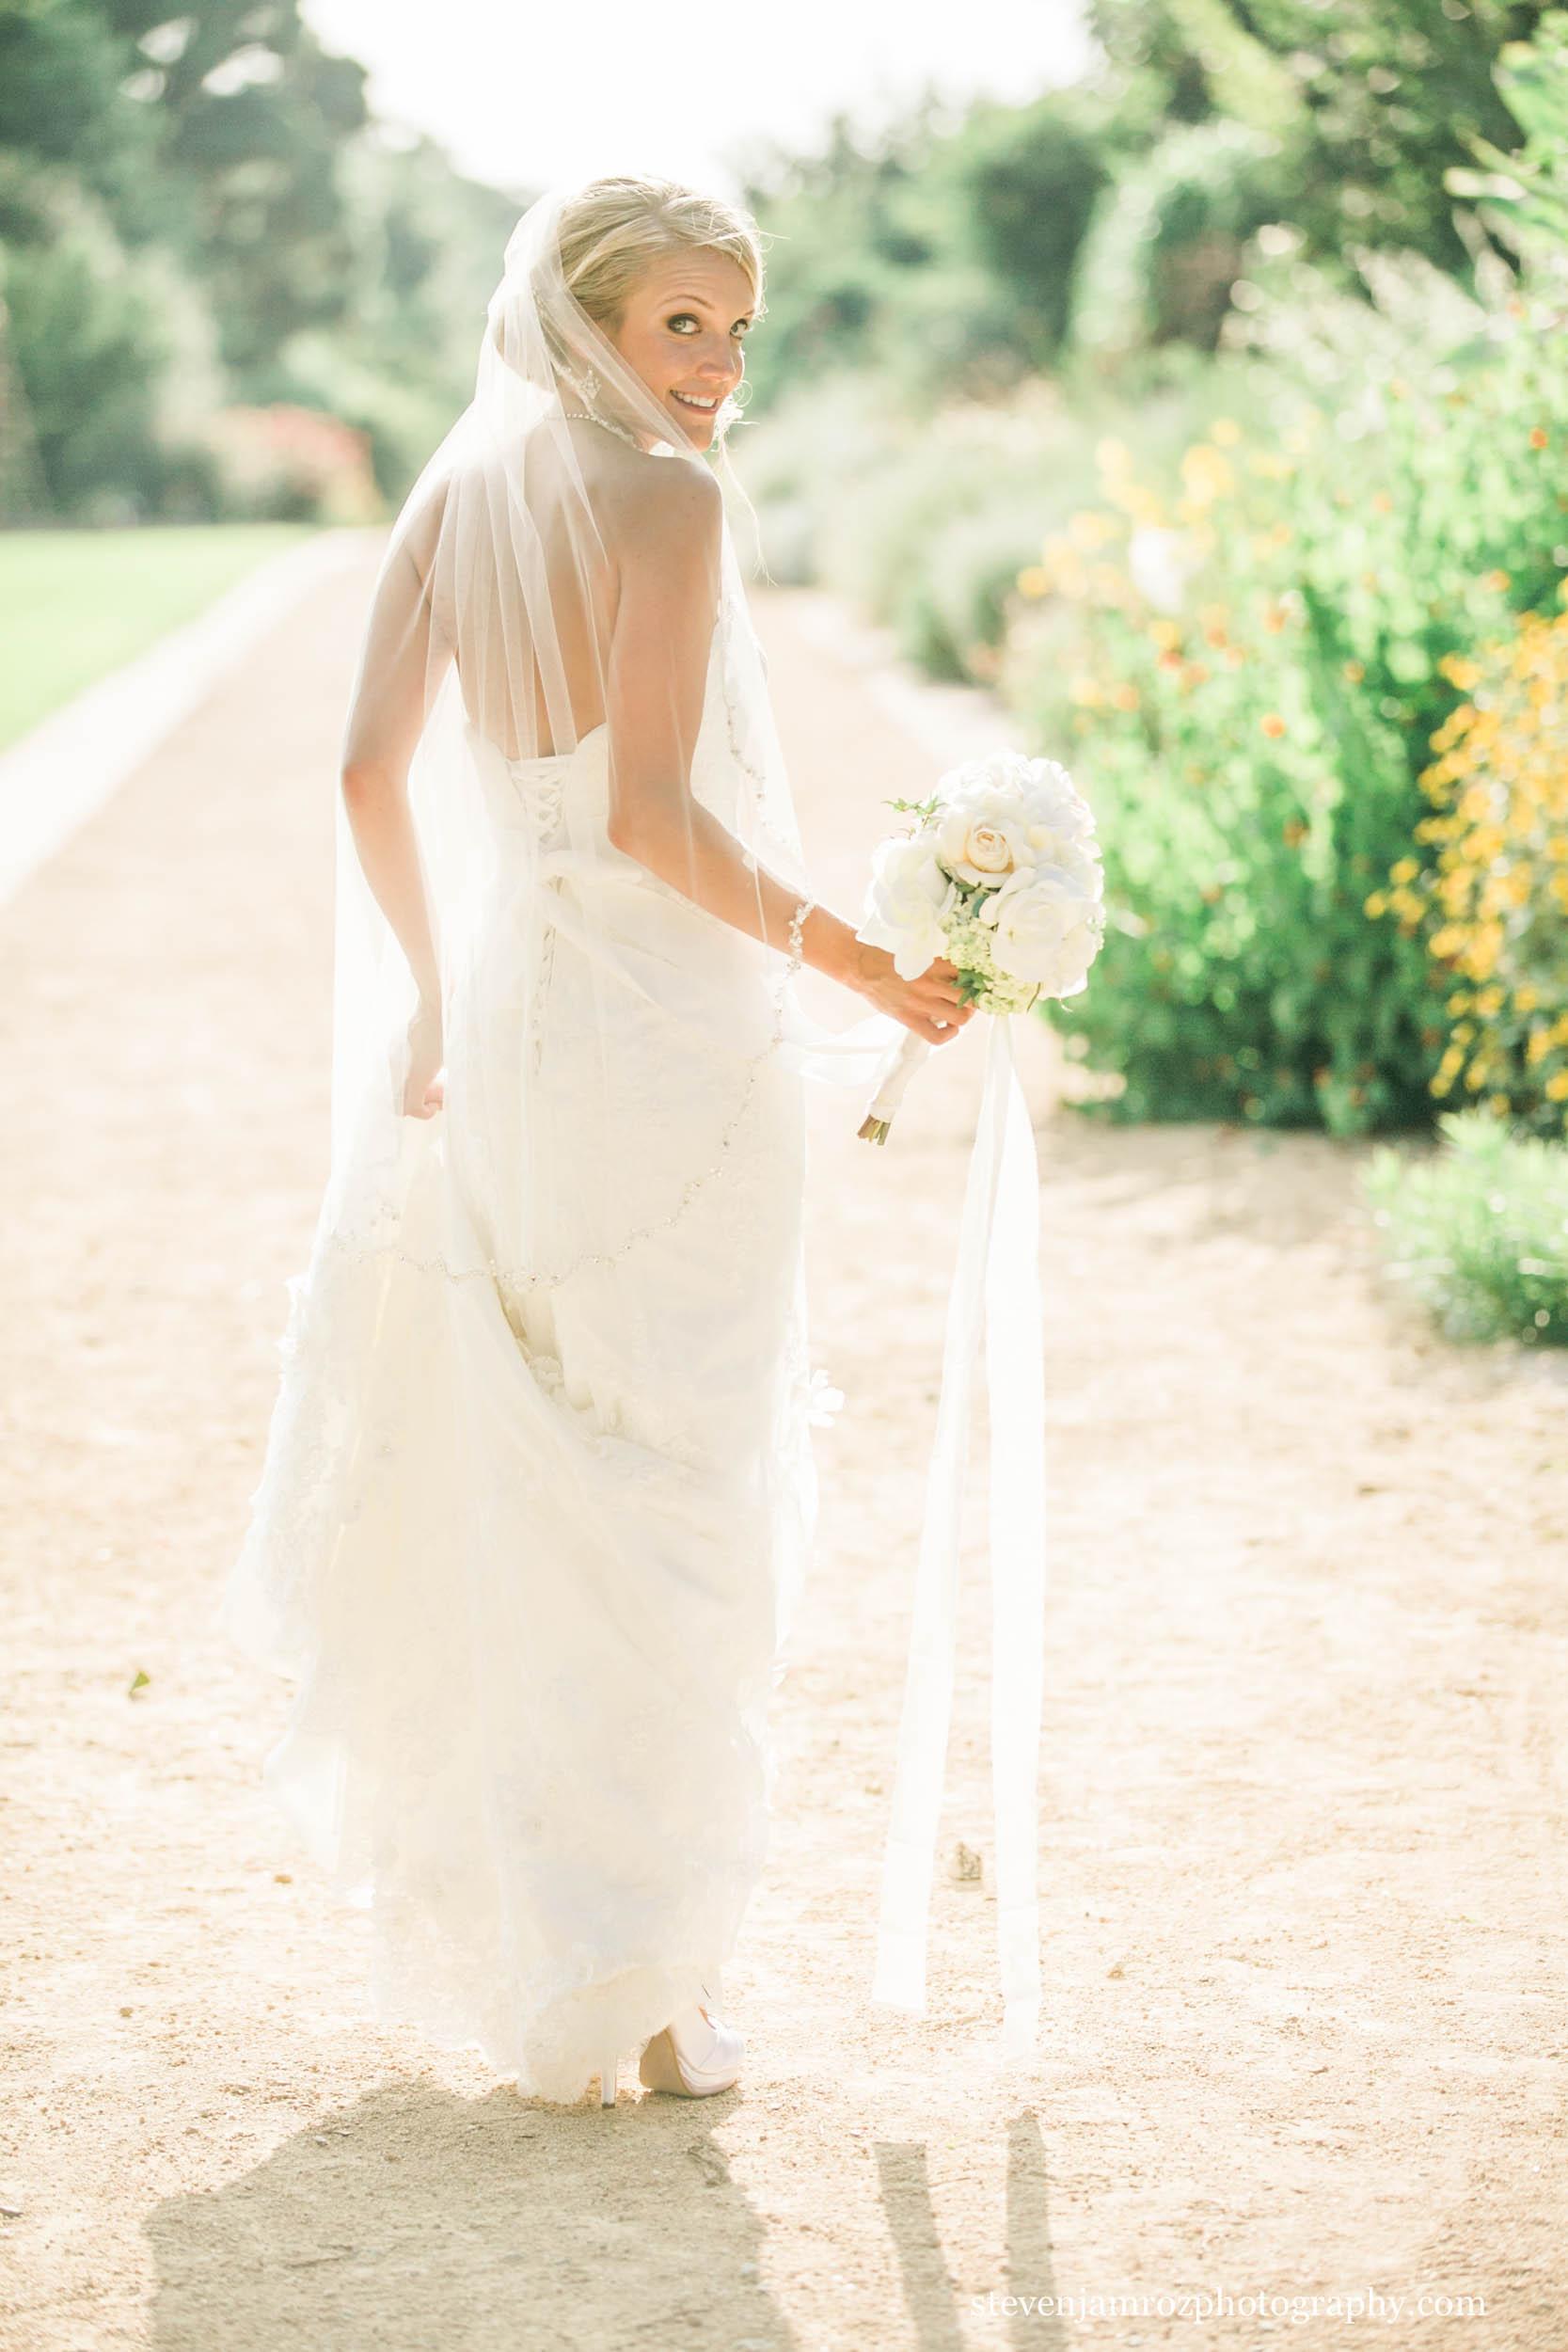 pretty-wedding-dress-steven-jamroz-photography-0540.jpg